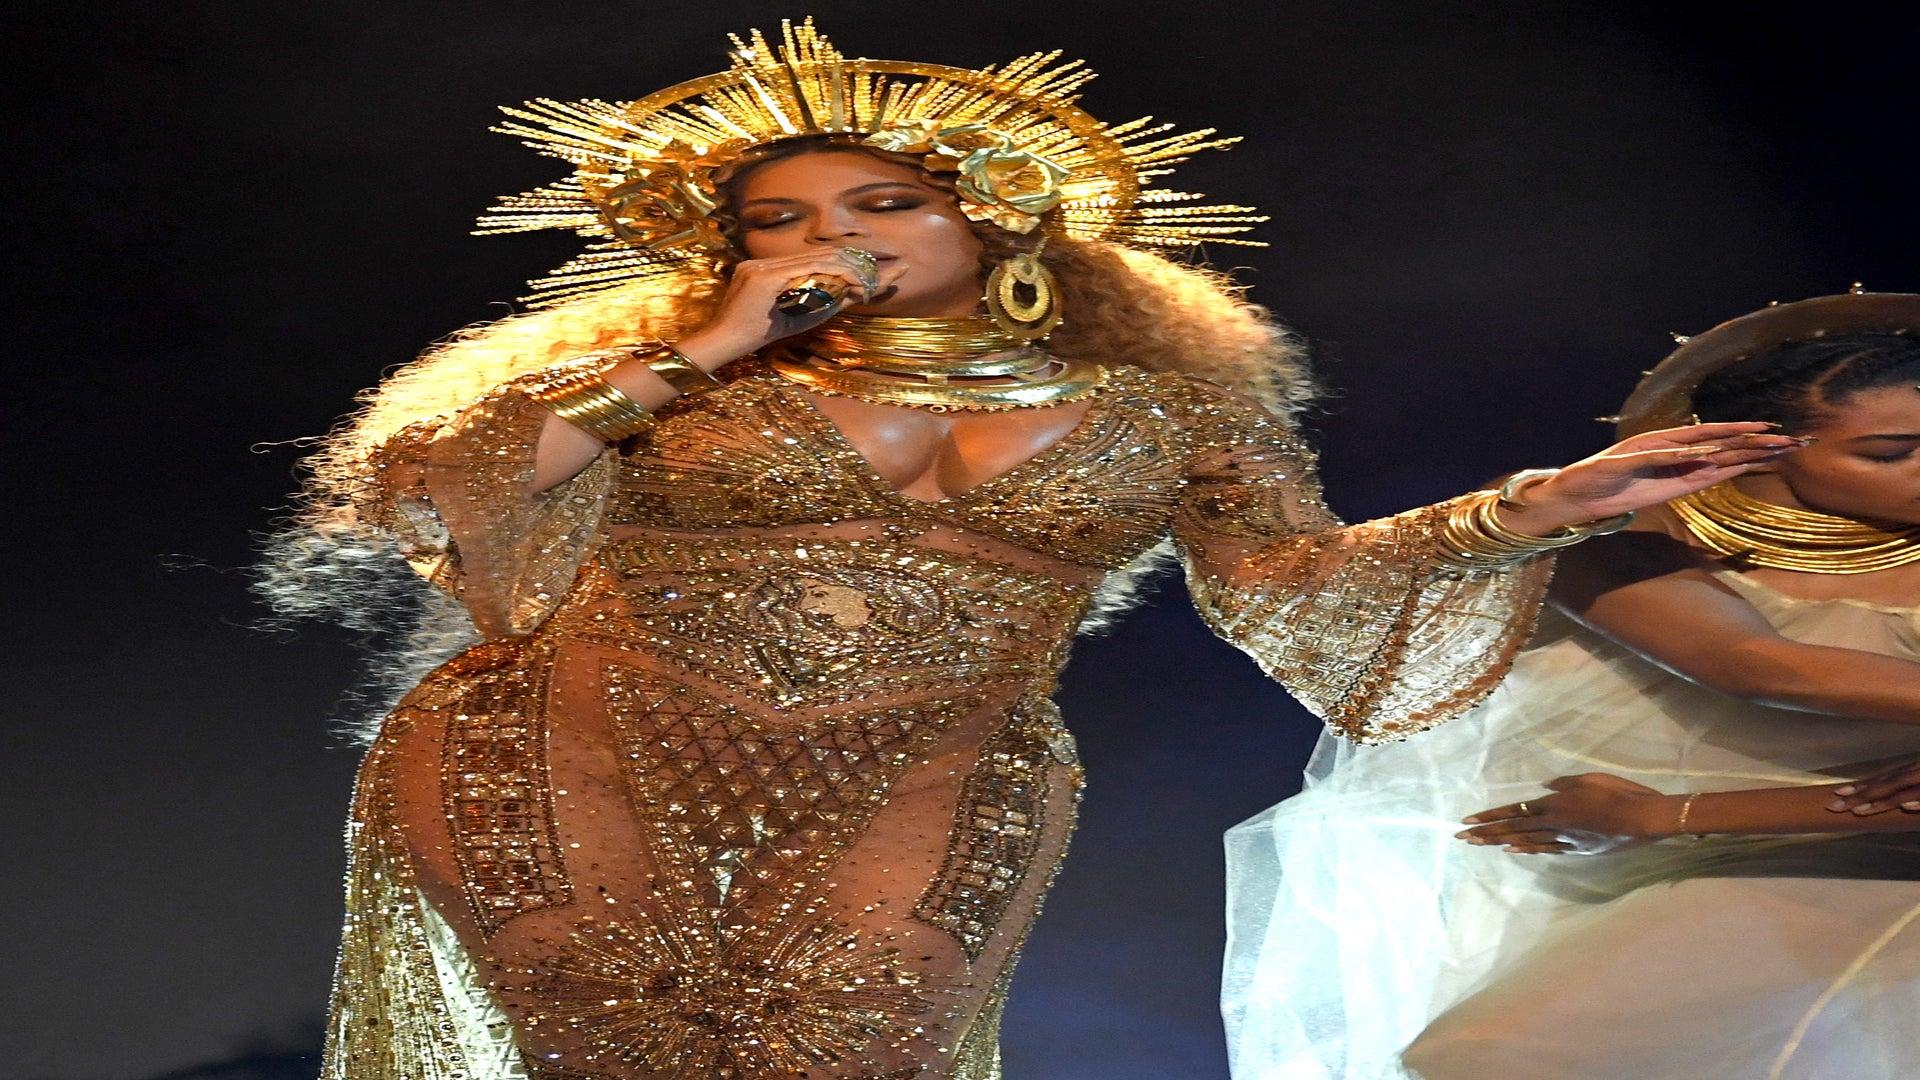 Beyoncé Lights up Grammy Awards in Breathtaking Gold Peter Dundas Gown